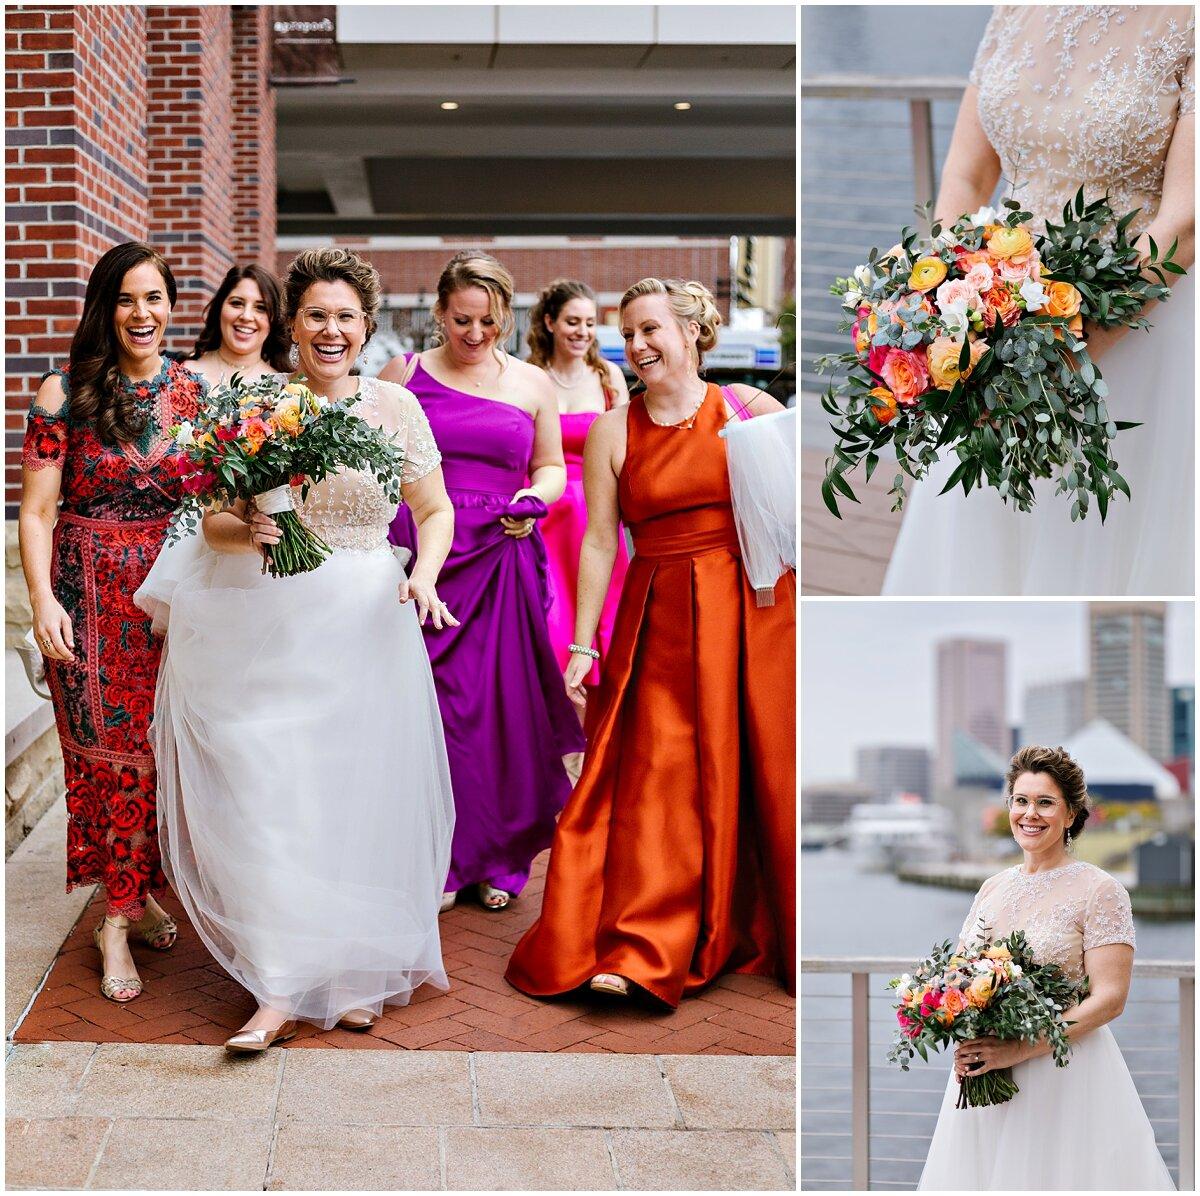 urban-row-photo-bright-fall-bridesmaid-dress-colors_0008.jpg